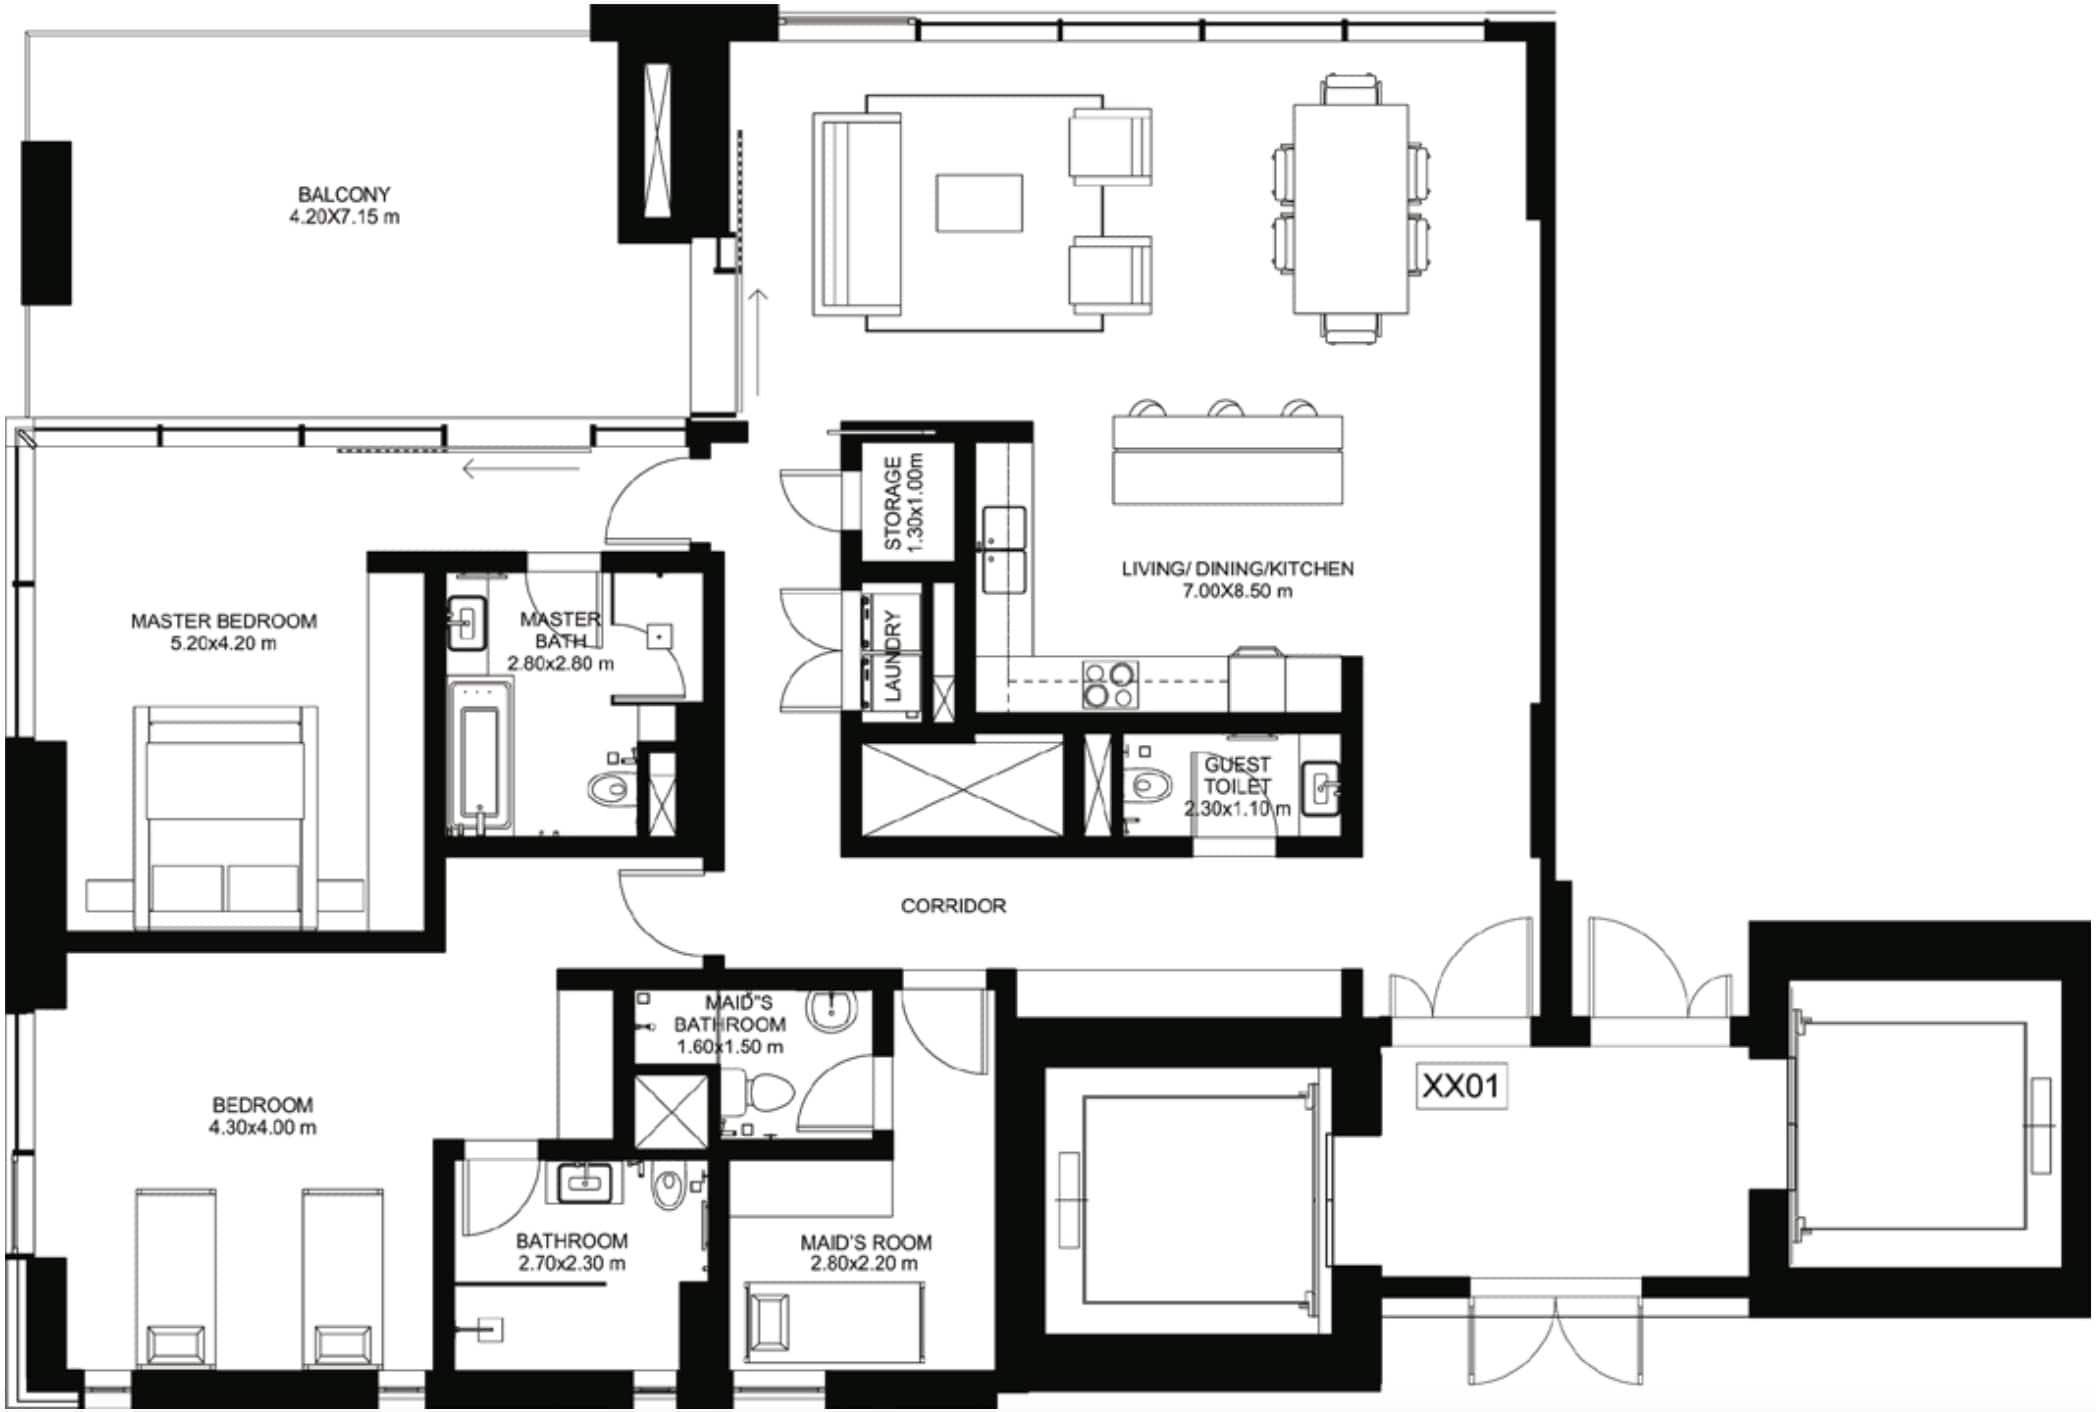 ONE JBR Apartments for Sale by Dubai Properties (1/JBR in Jumeirah Beach Residence)